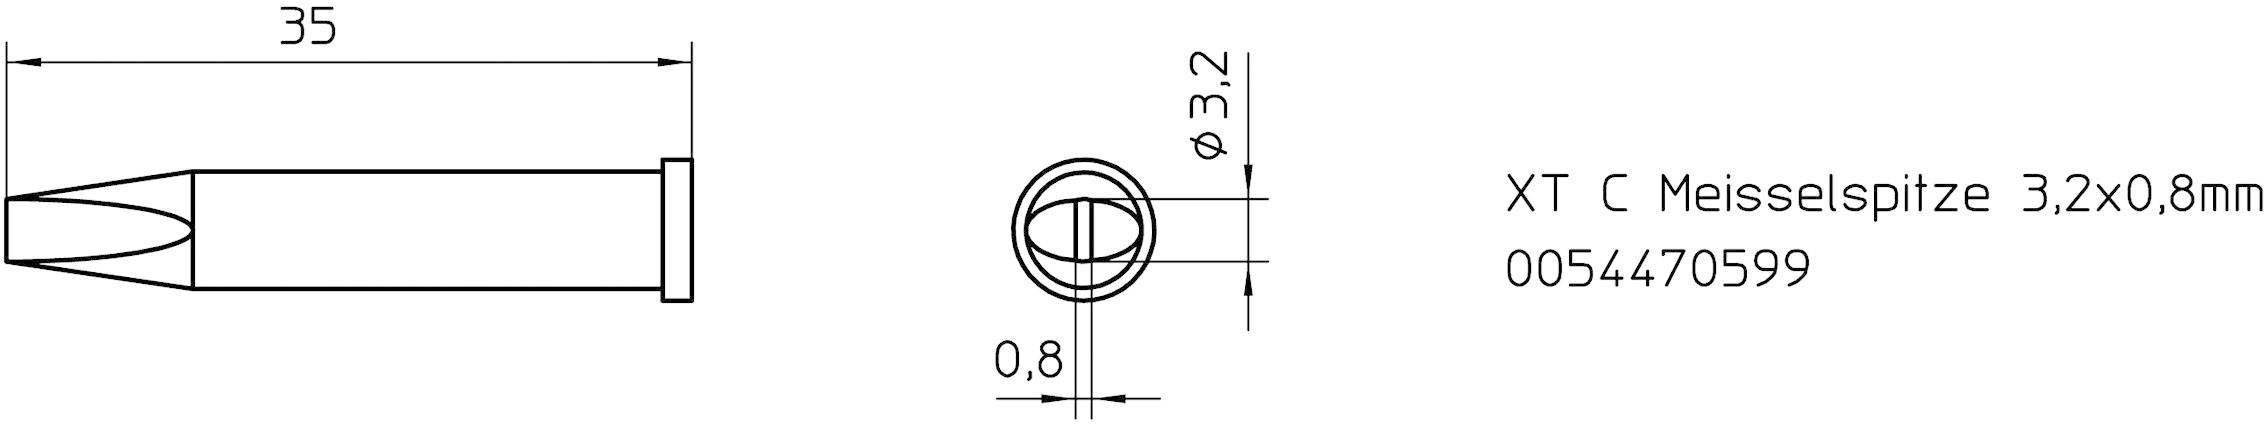 Spájkovací hrot dlátová forma Weller Professional XT-C, velikost hrotu 3.2 mm, 1 ks